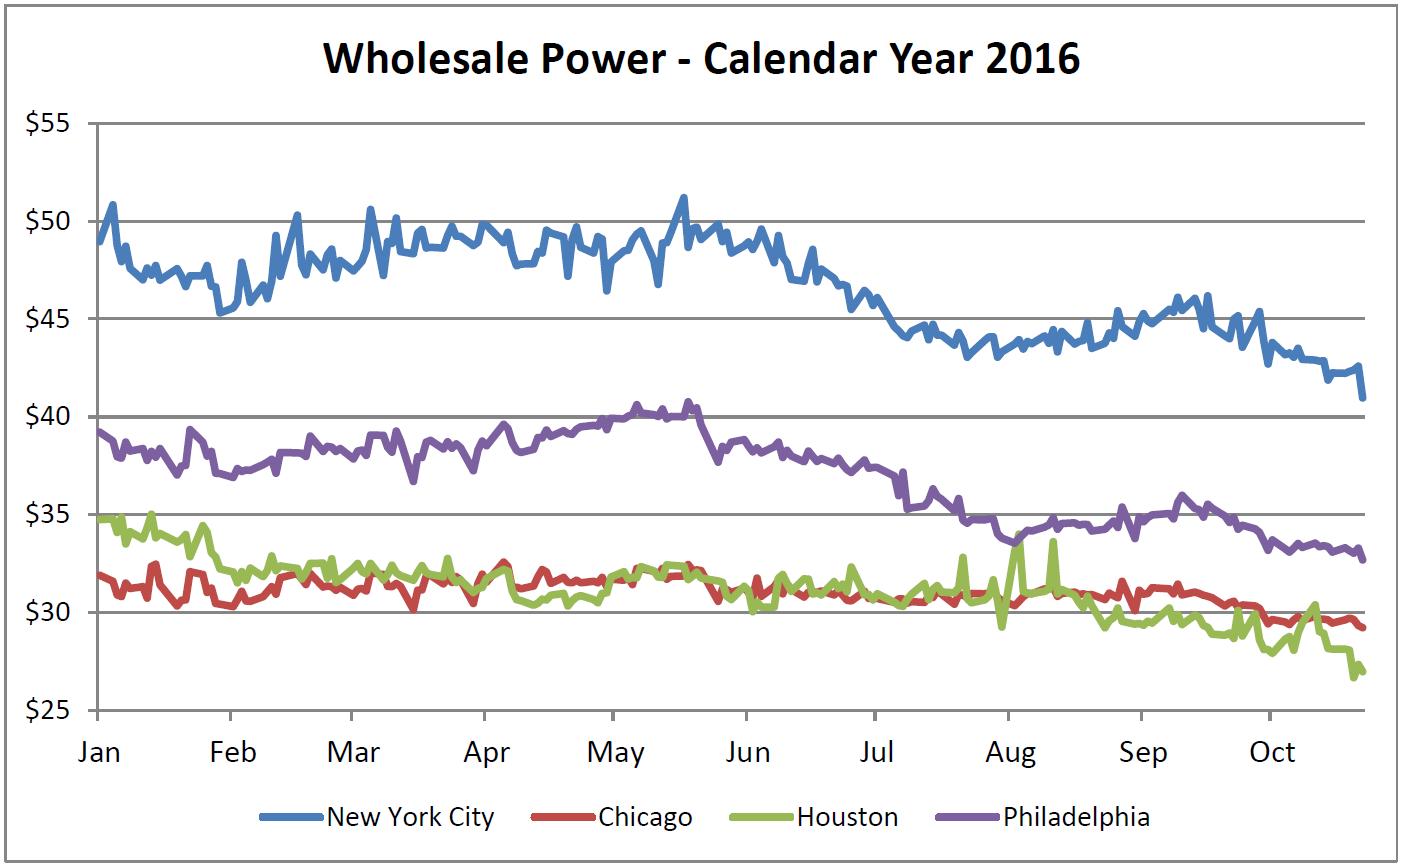 Wholesale Power - Calendar Year 2016